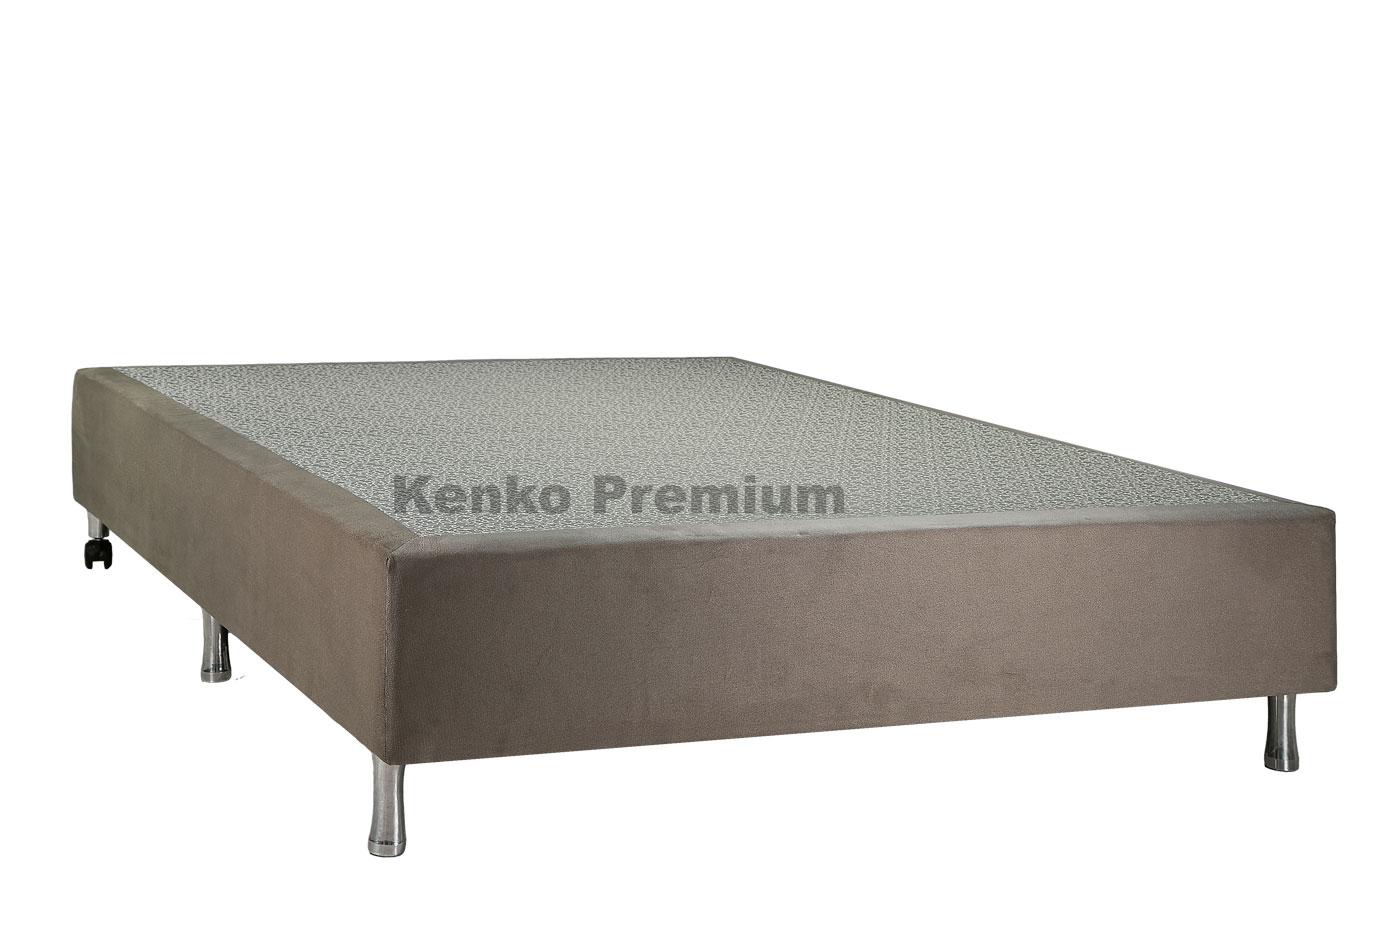 Box Base Para Colchão Iluminado Queen Size 1,58x1,98 Usb C/kit Conect Suede Kenko Premium   - Kenko Premium Colchões